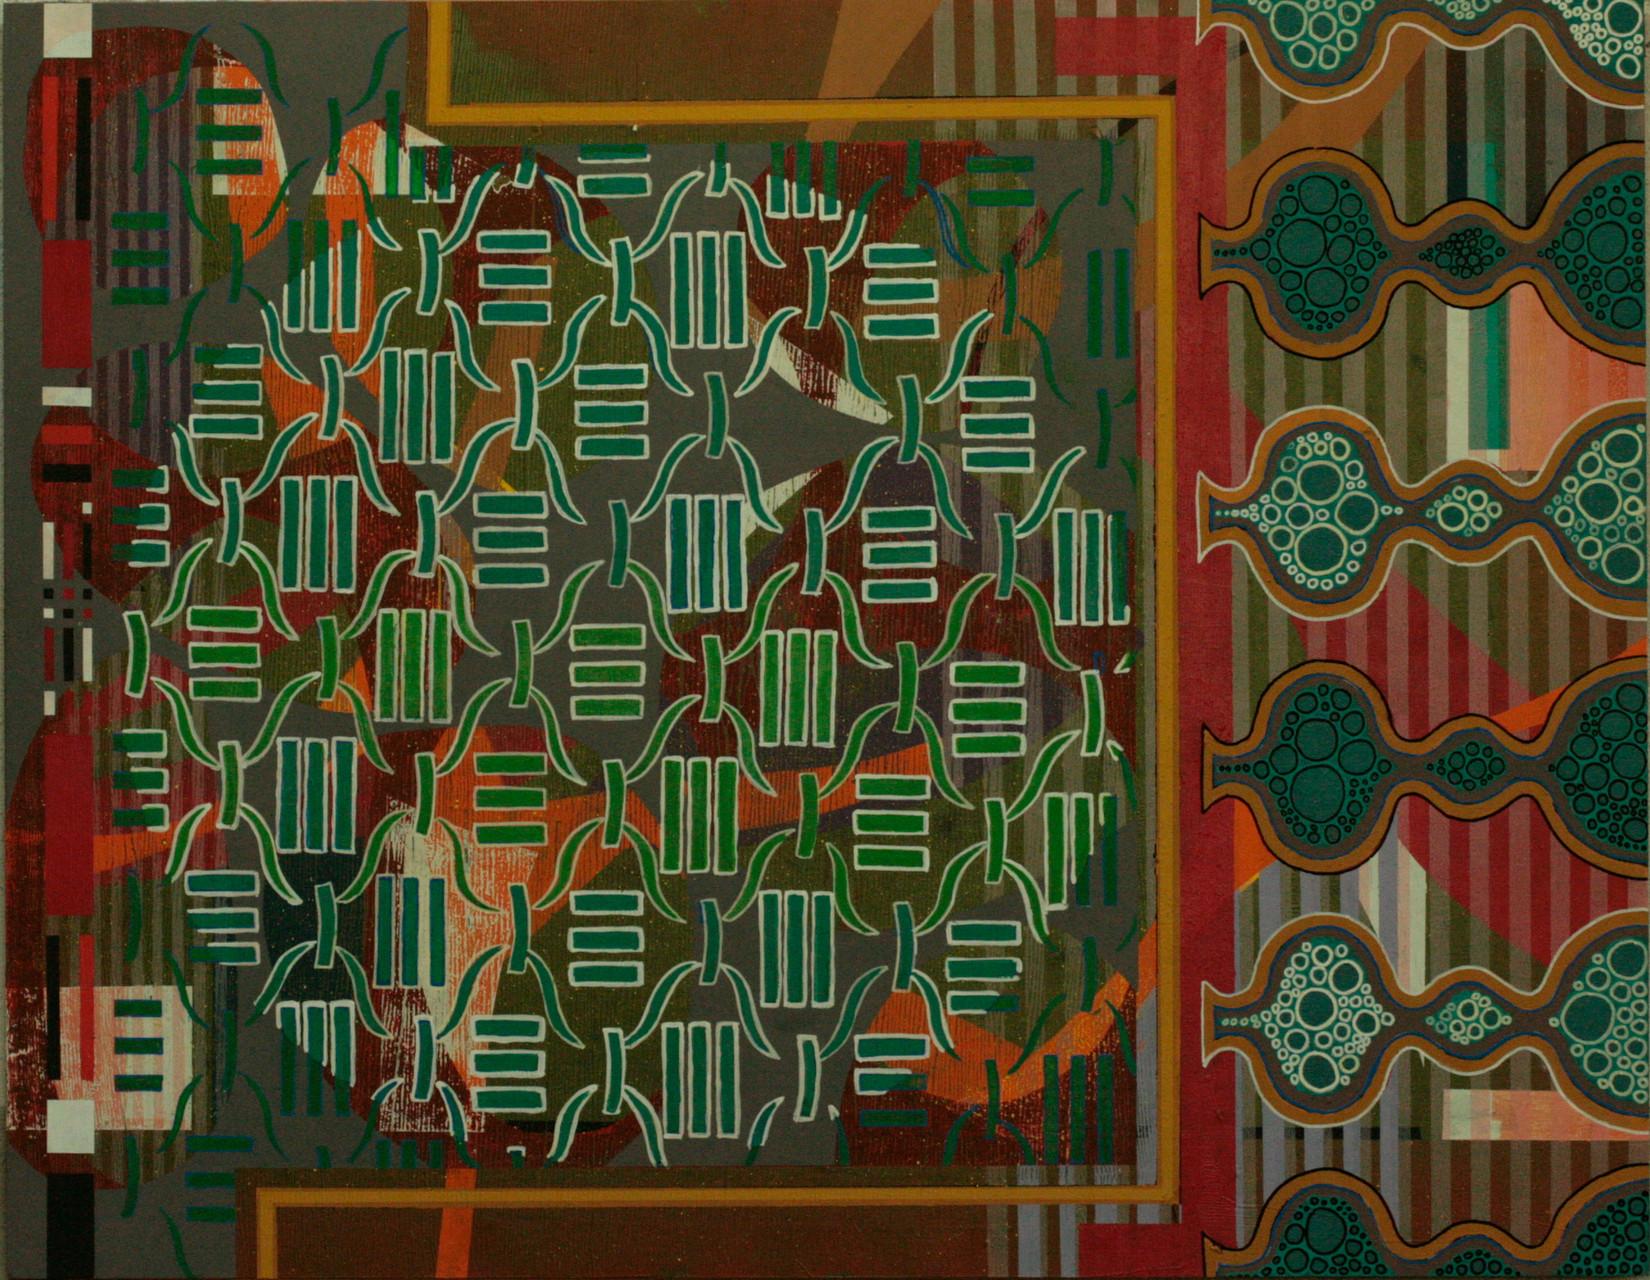 CÍRCULO DE OCNOS. Acrílico sobre madera. 146X114 cm.   2015